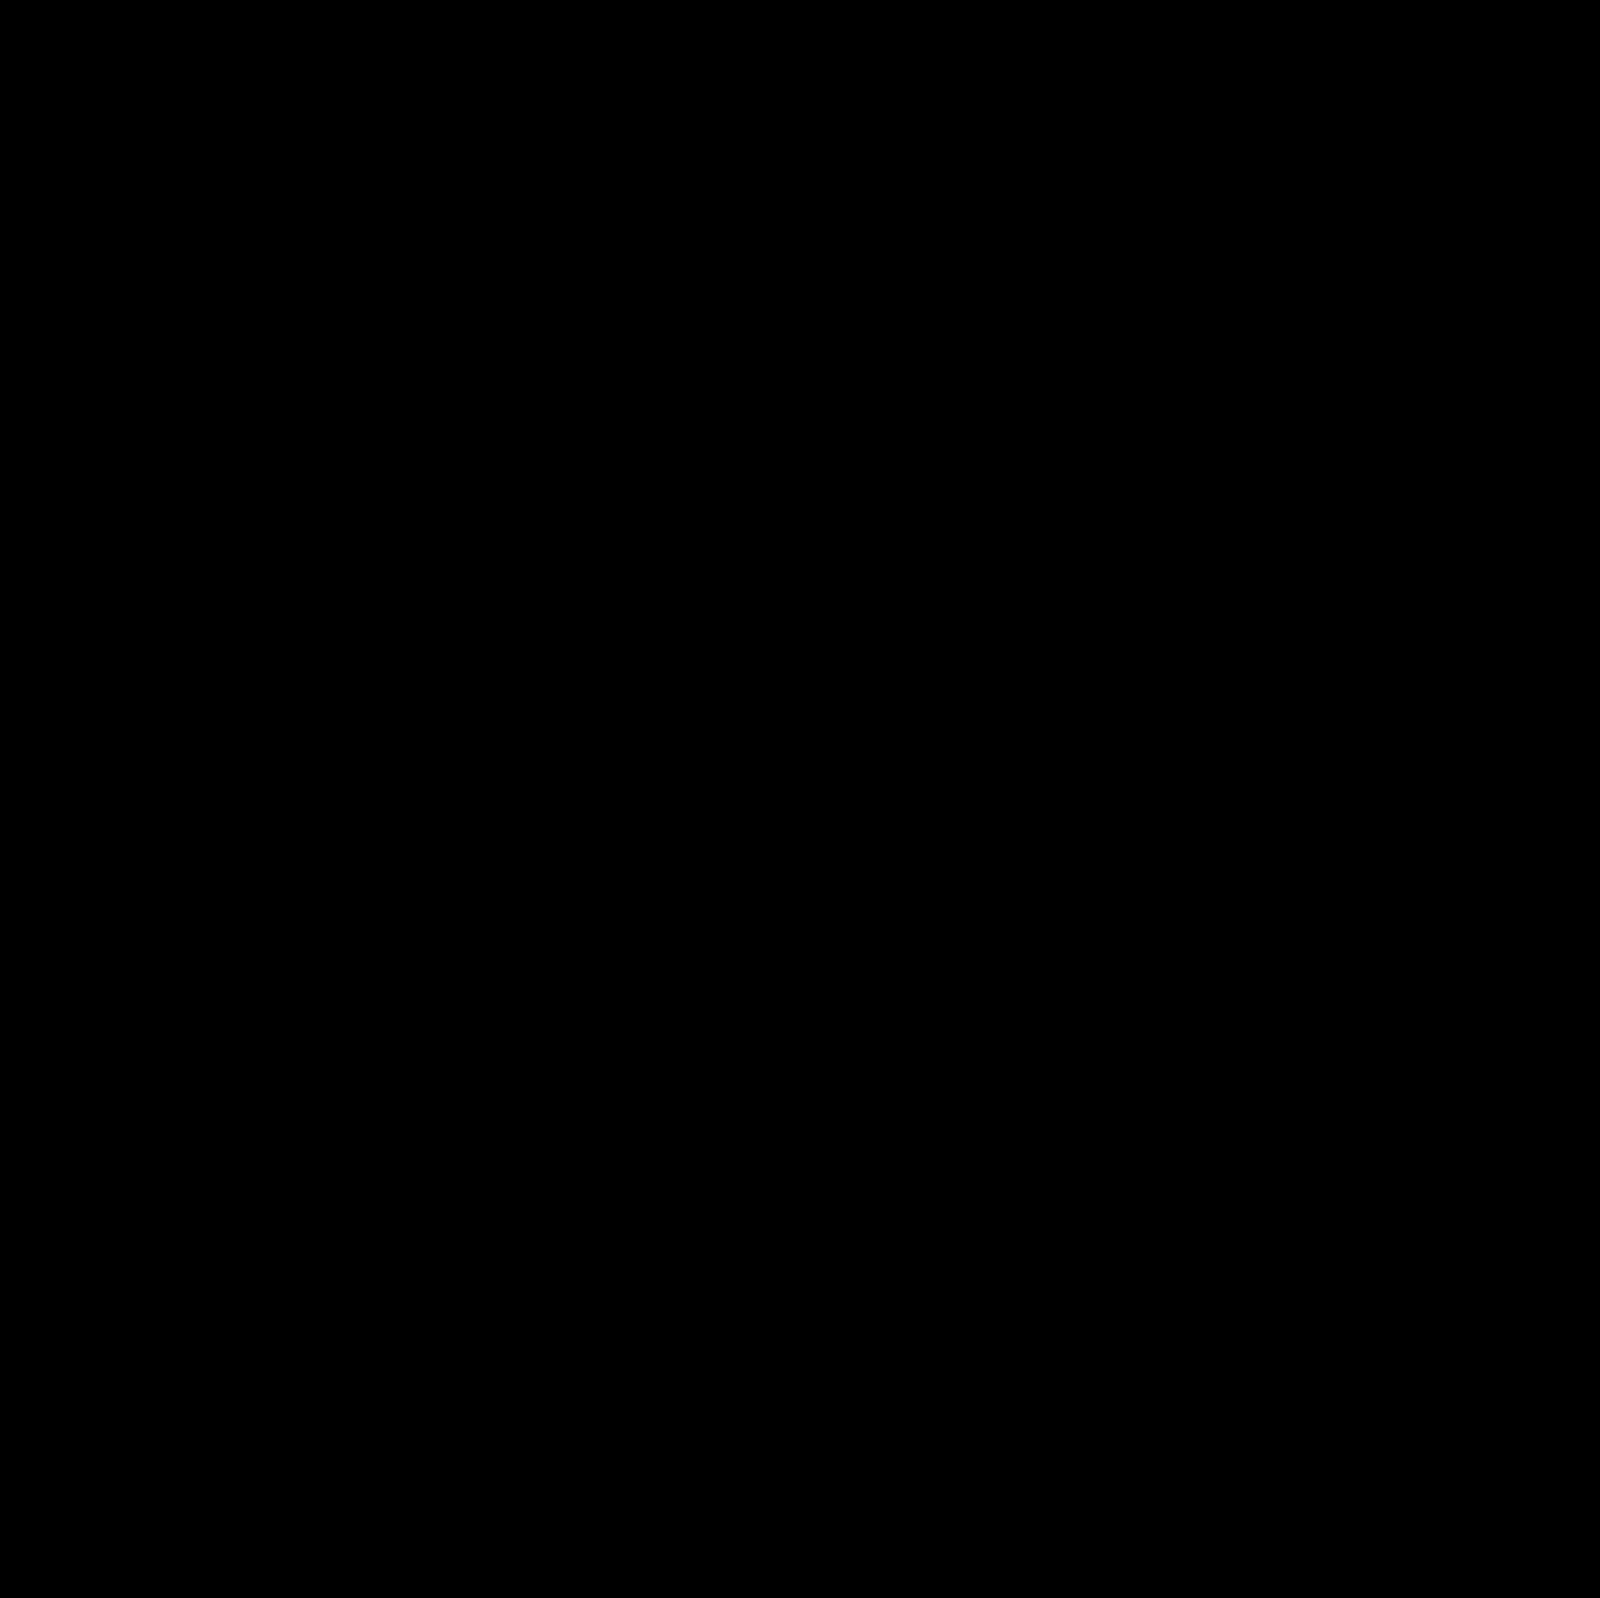 1756_-_empire_insignia_logo_star_wars.png